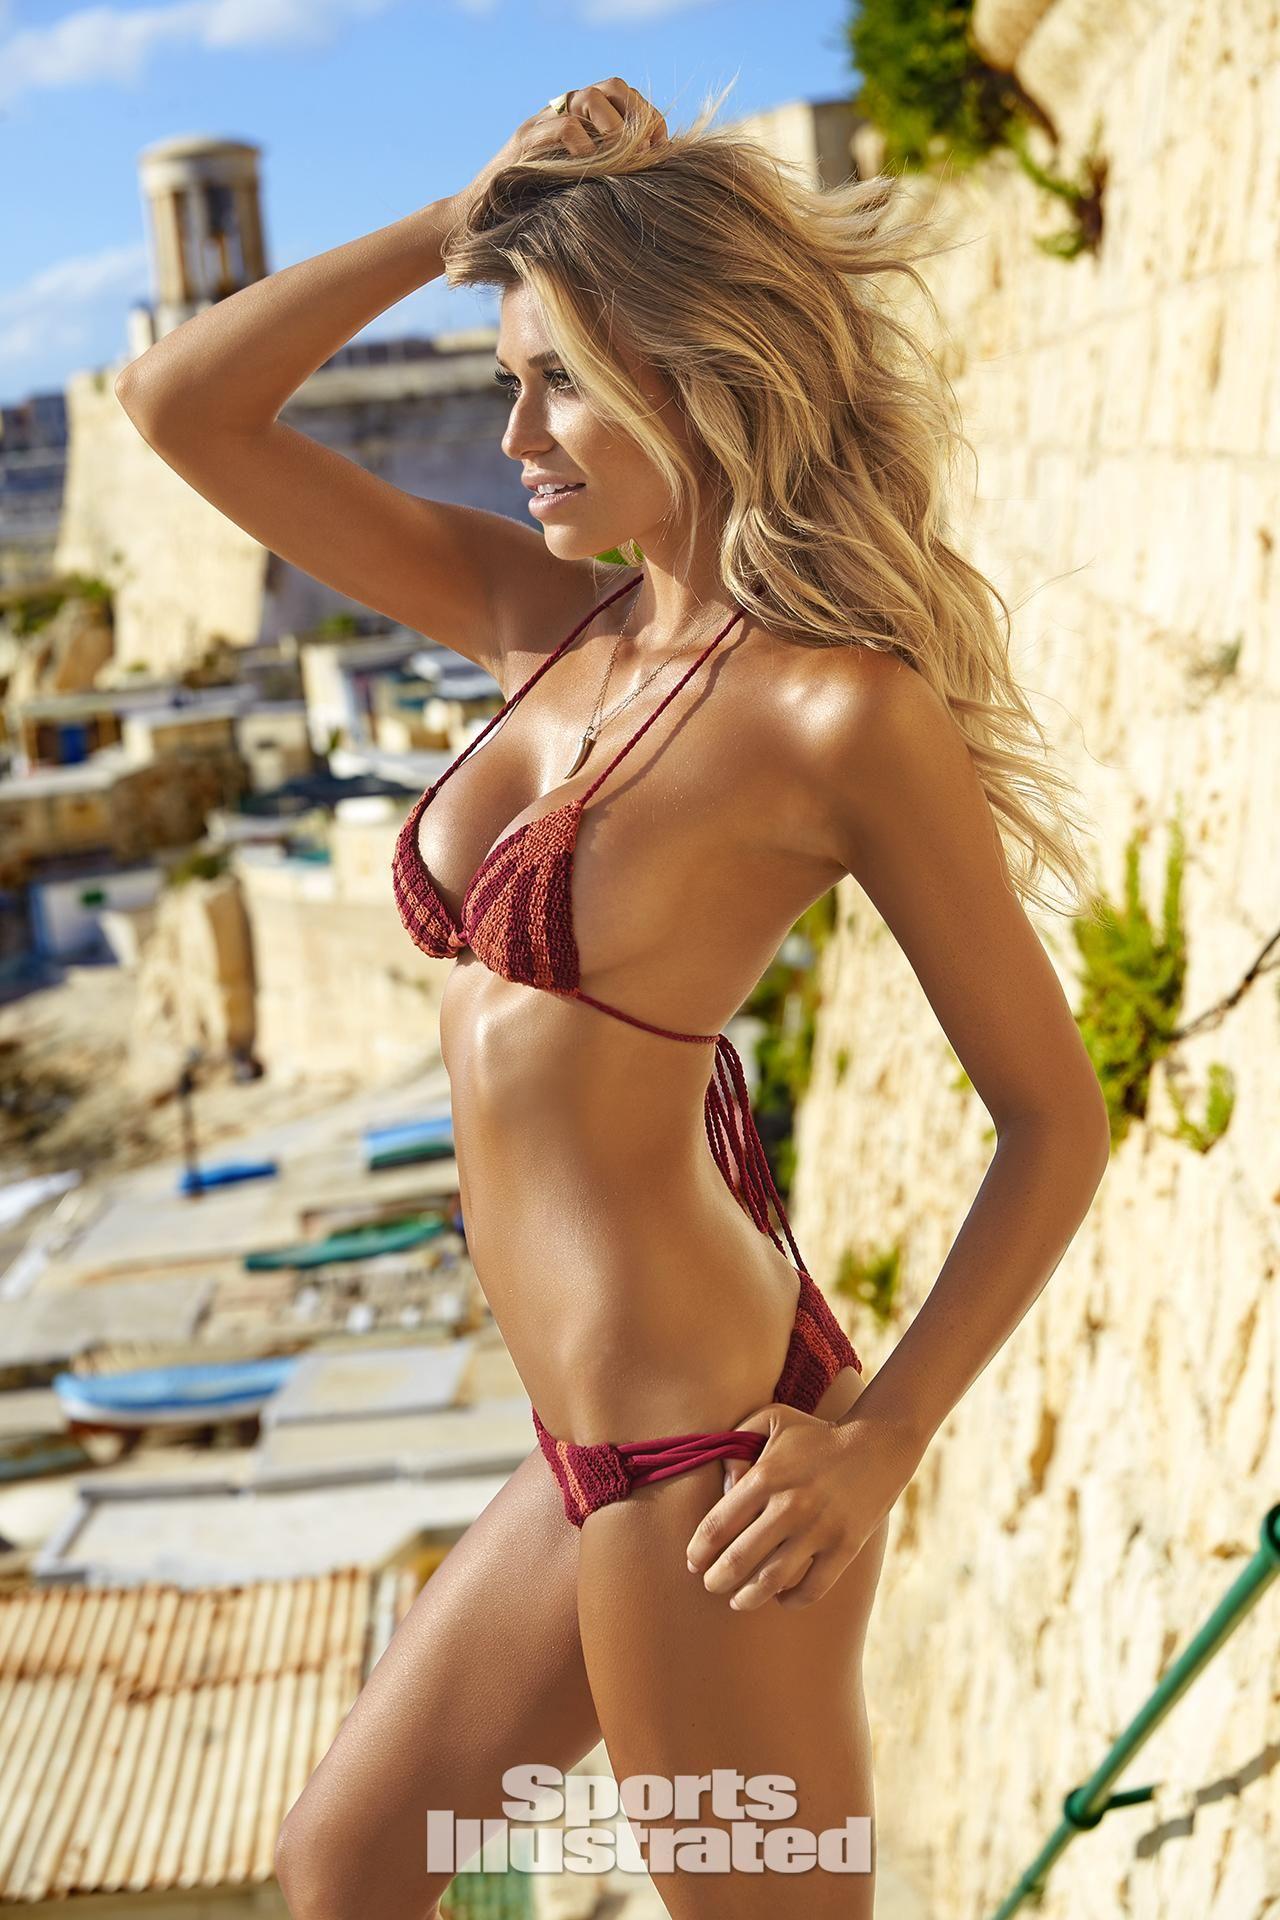 Kehlani cleavage,Iggy azalea titties for instagram Sex fotos Mariana braga,Kylie jenner sexy 7 Photos gifs